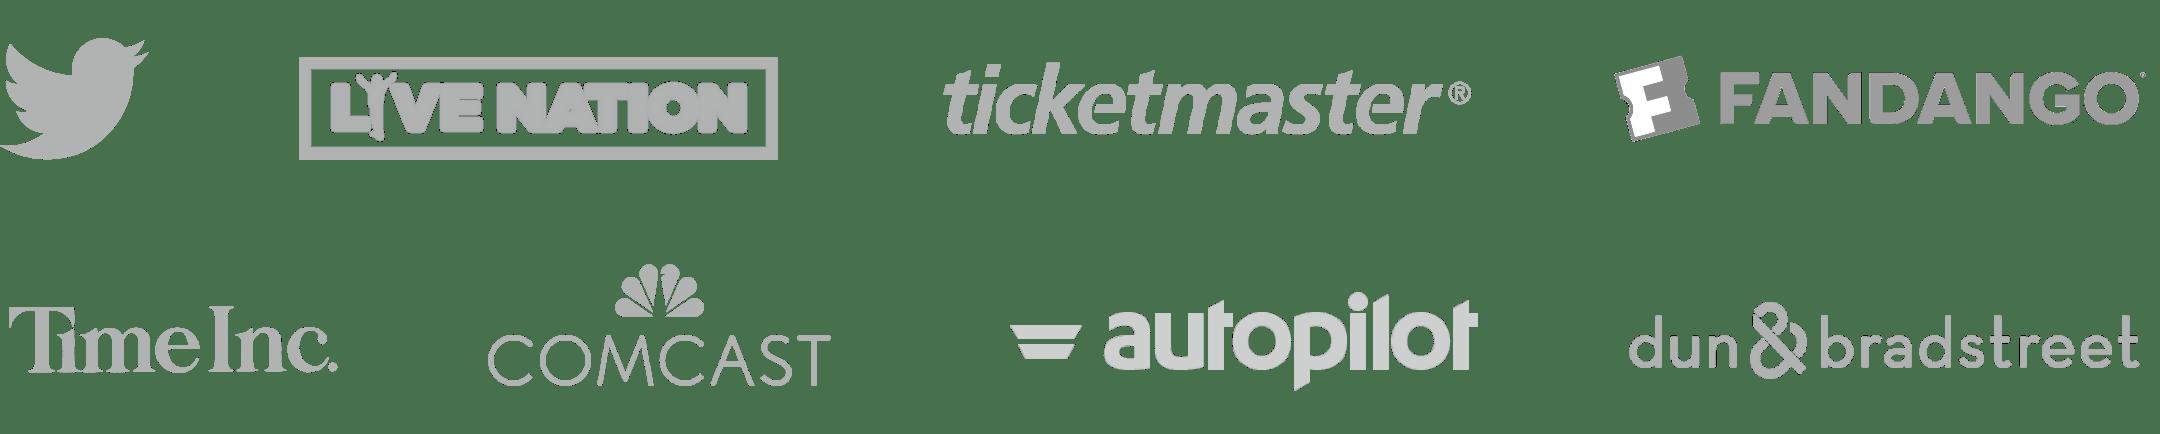 Twitter, LiveNation, TicketMaster, Fandango, Time Inc, Comcast, Autopilot, Dun ∓ Bradstreet